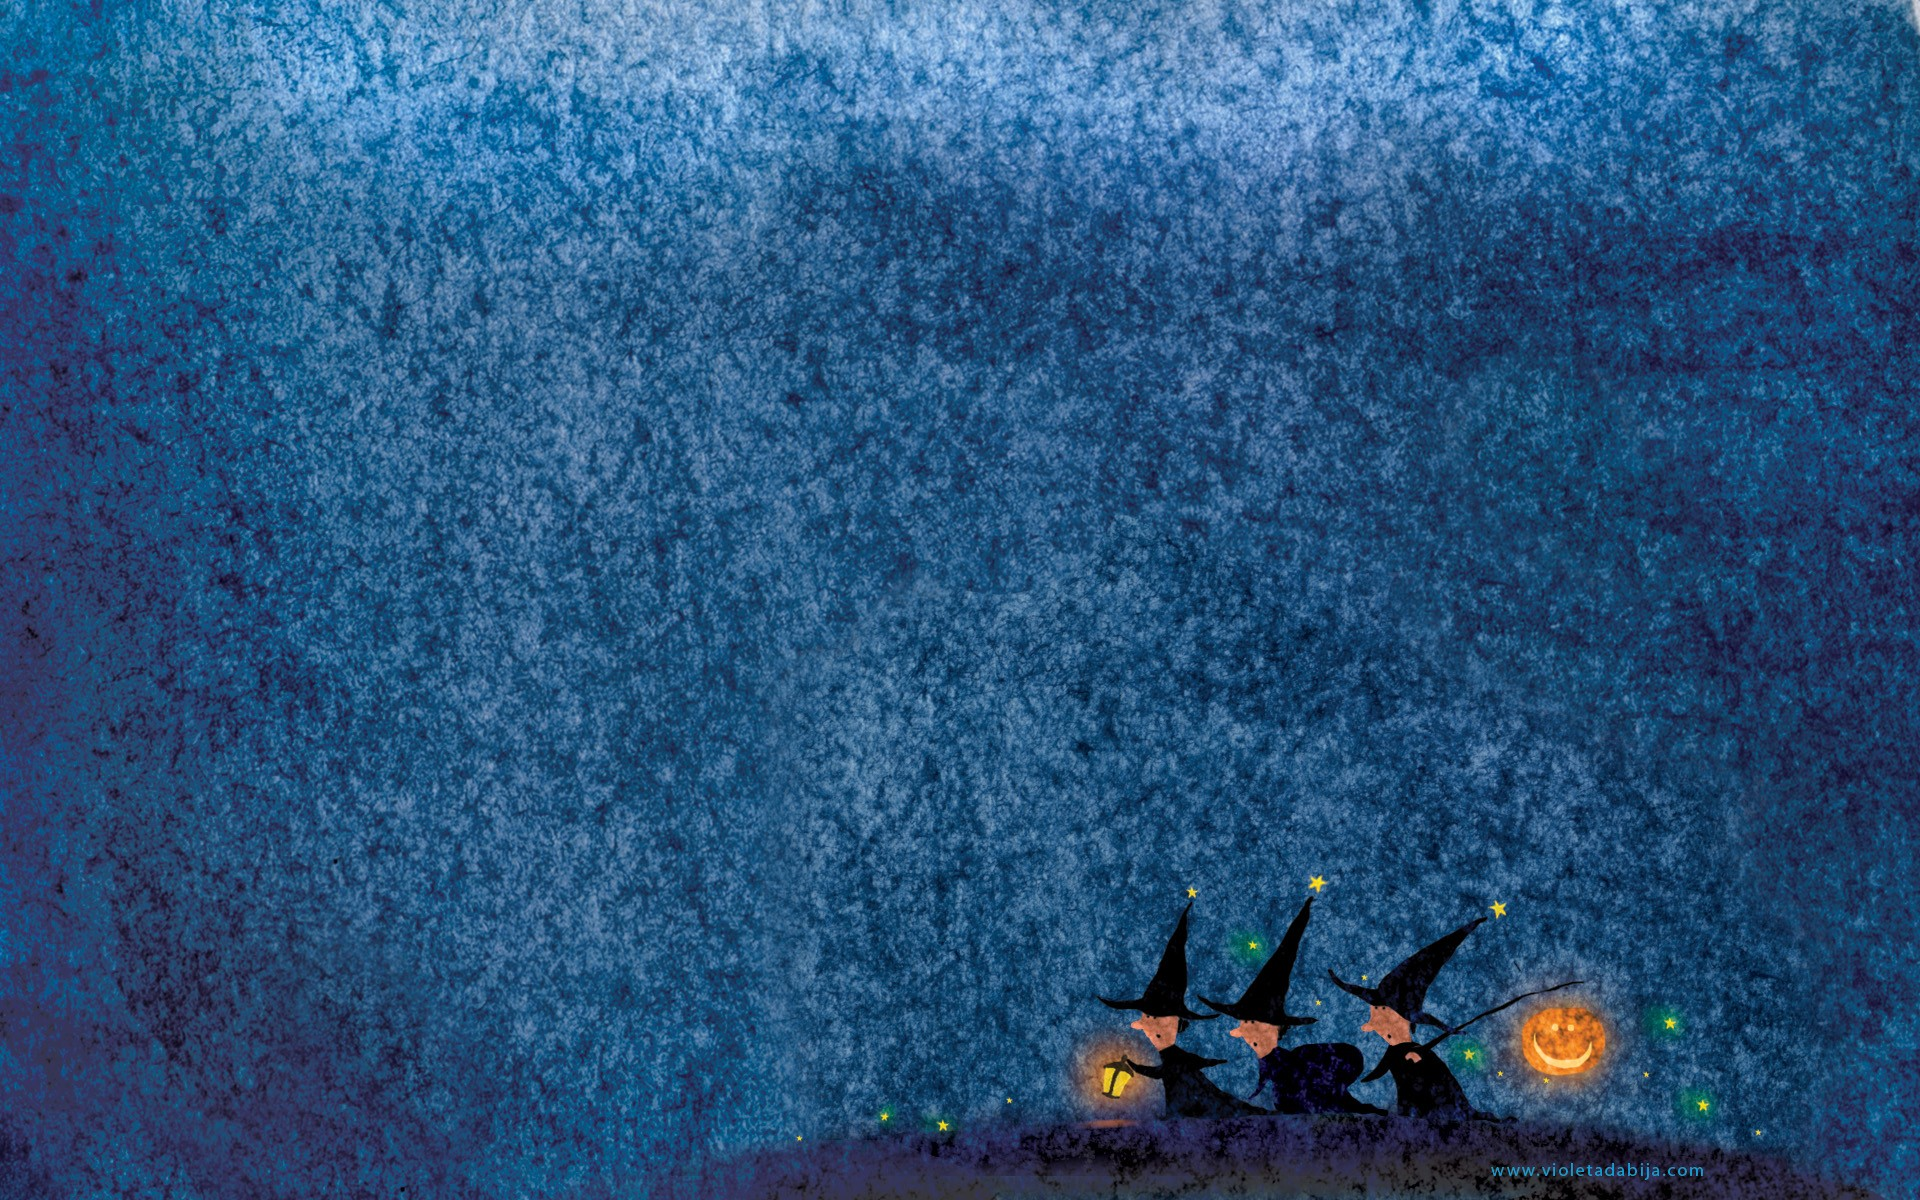 23 halloween backgrounds desktop download free amazing - Cute screensavers for kids ...